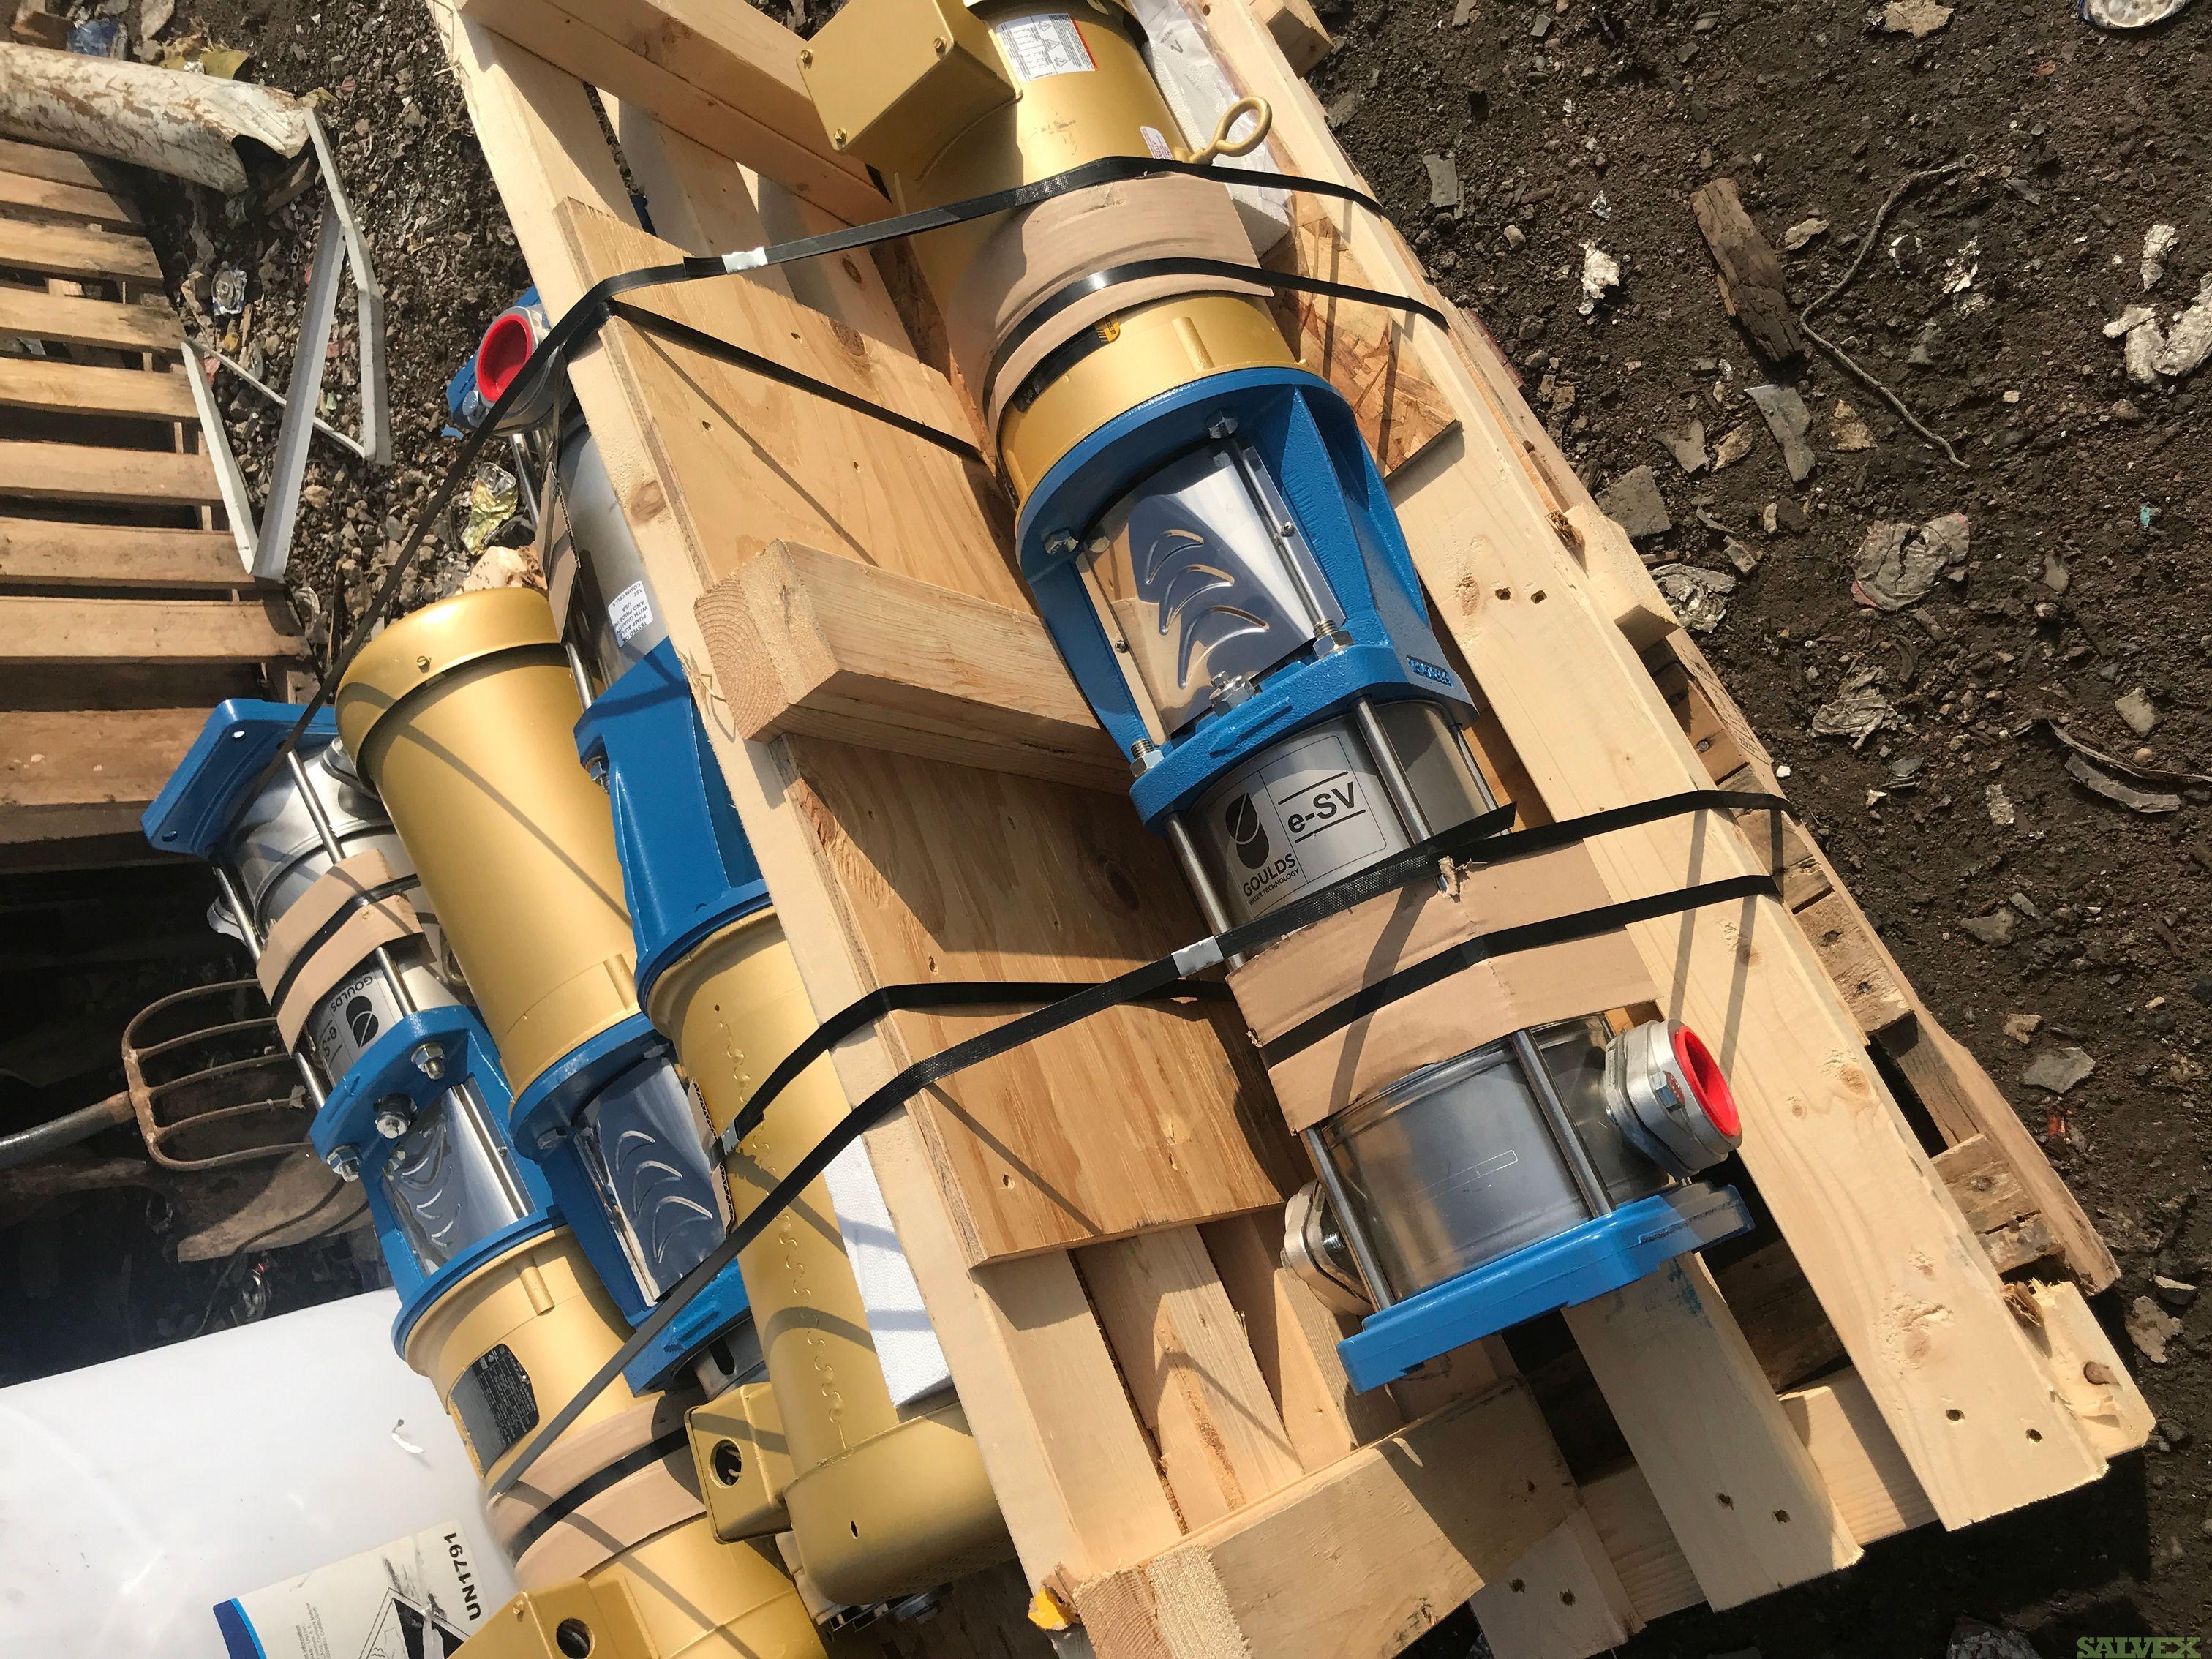 Goulds e-SV Vertical Multi-stage pumps - 4 units